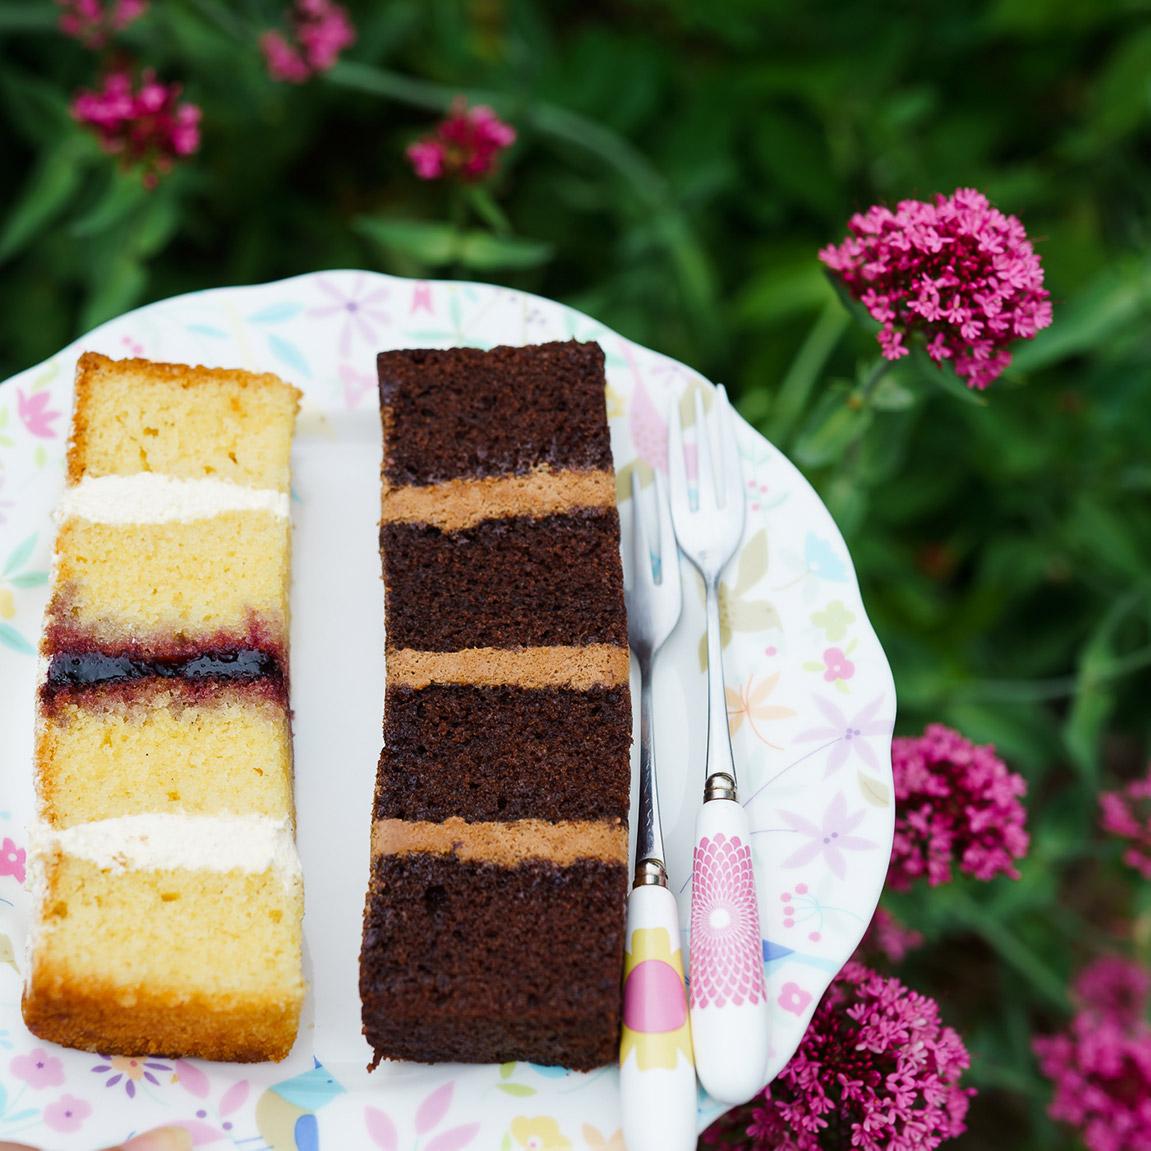 Vanilla and Chocolate Wedding Cake Slices on Plate